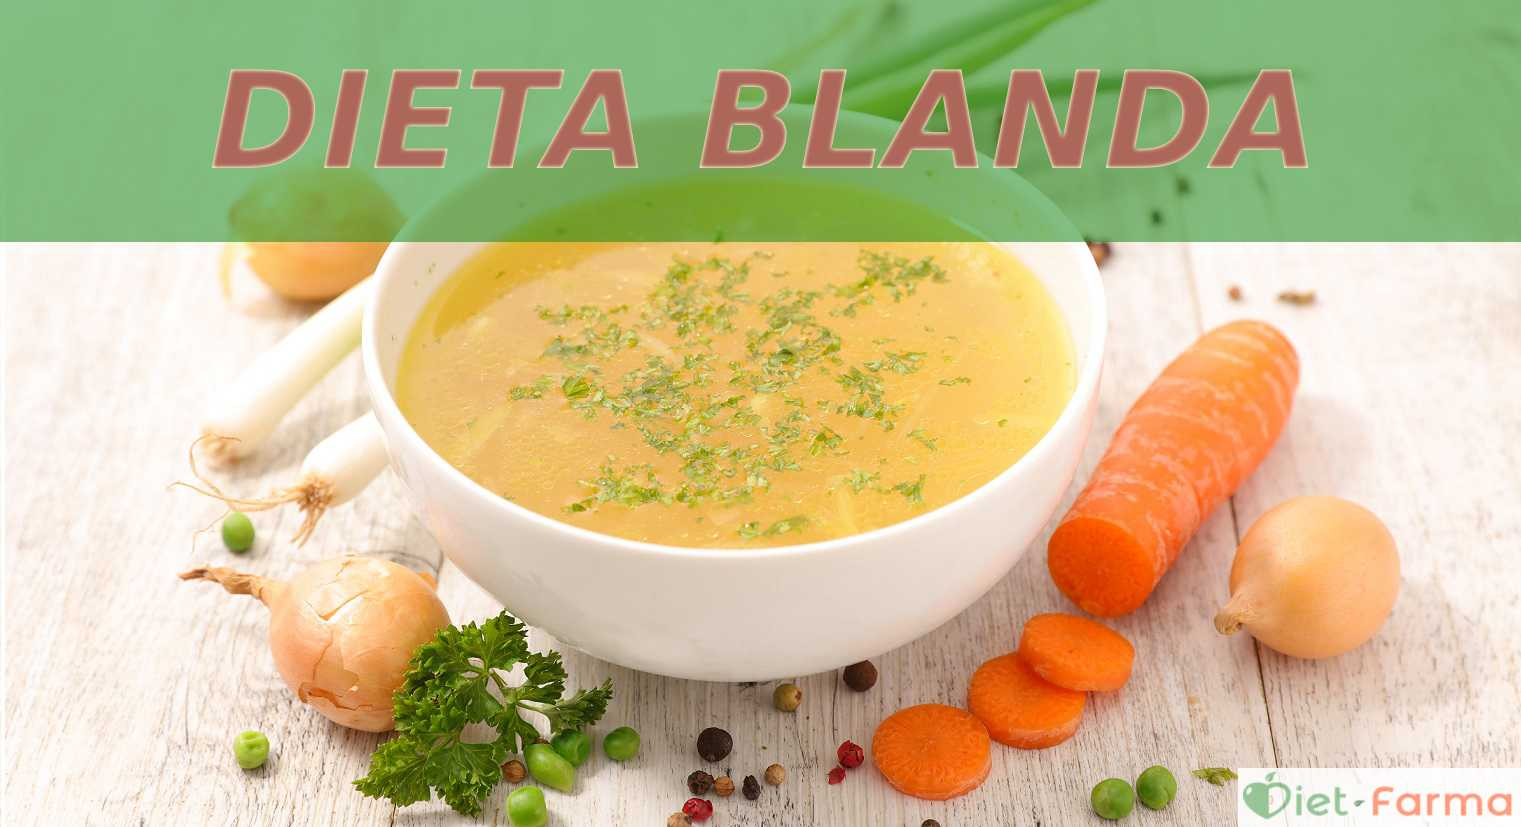 Dieta blanda para ulcera gastrica